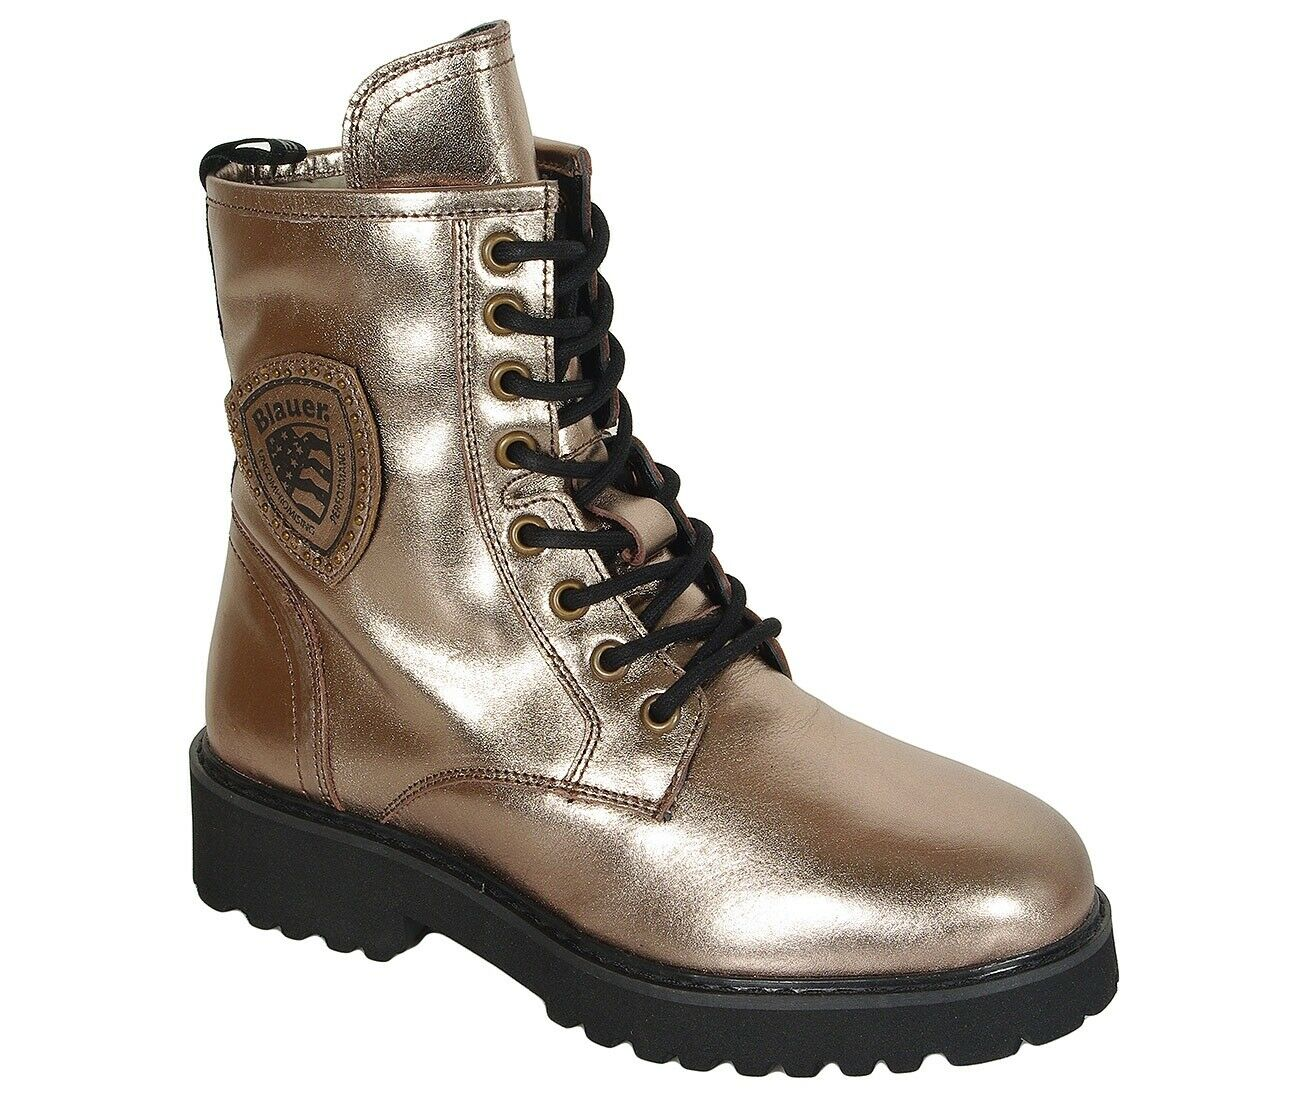 Gr. Serie, Closed Trippen Schuhe Damen 37 Lagenlook (38